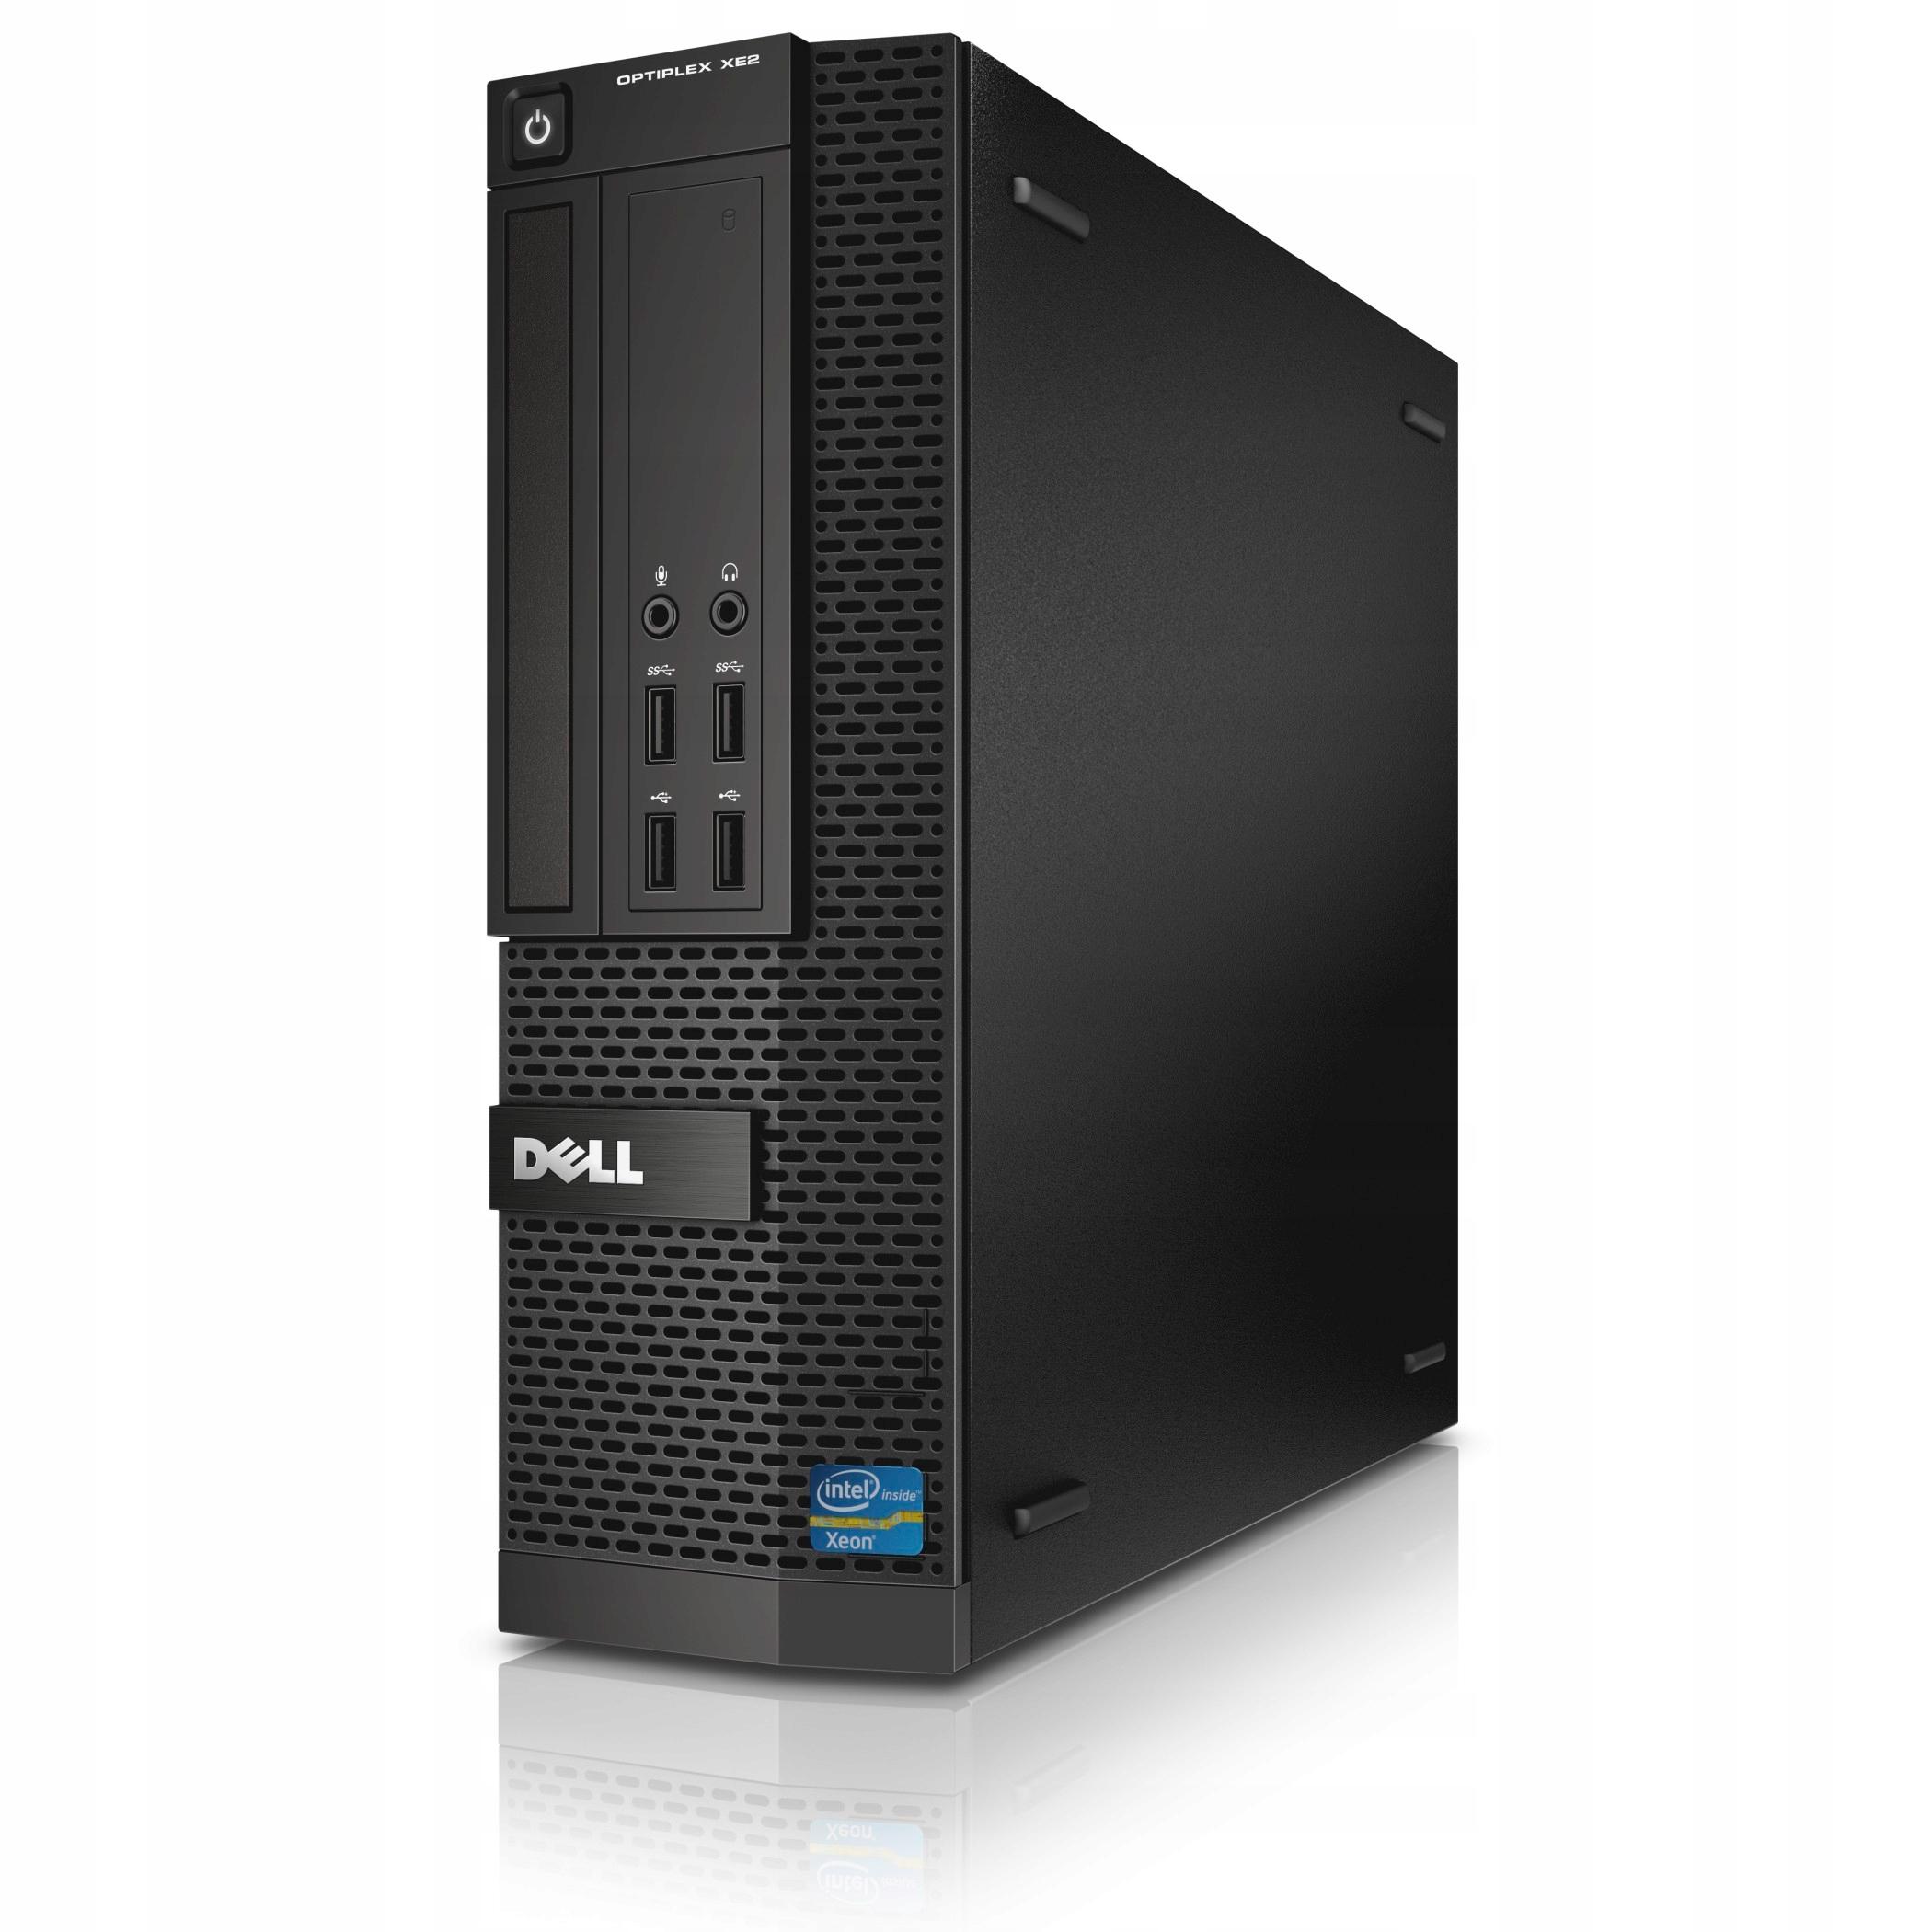 Dell XE2 I7-4770S 16GB RAM 256SSD 1GB GPU 24mce GW